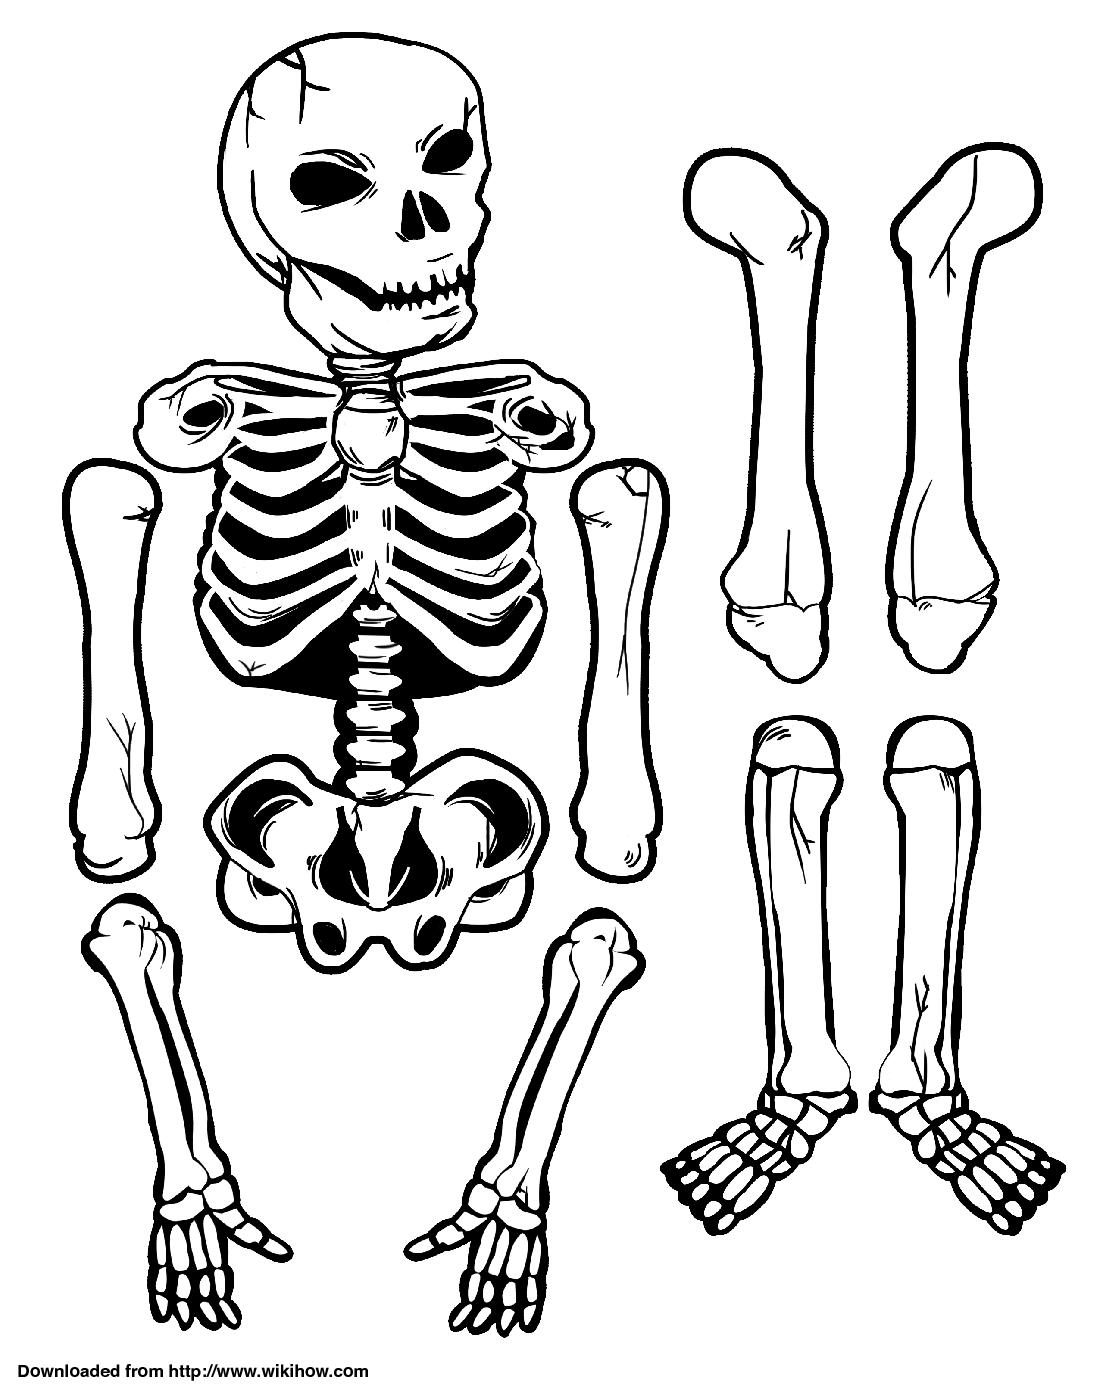 image regarding Printable Skeletons referred to as Printable Skeleton - wikiHow Halloween Skeleton, Collage